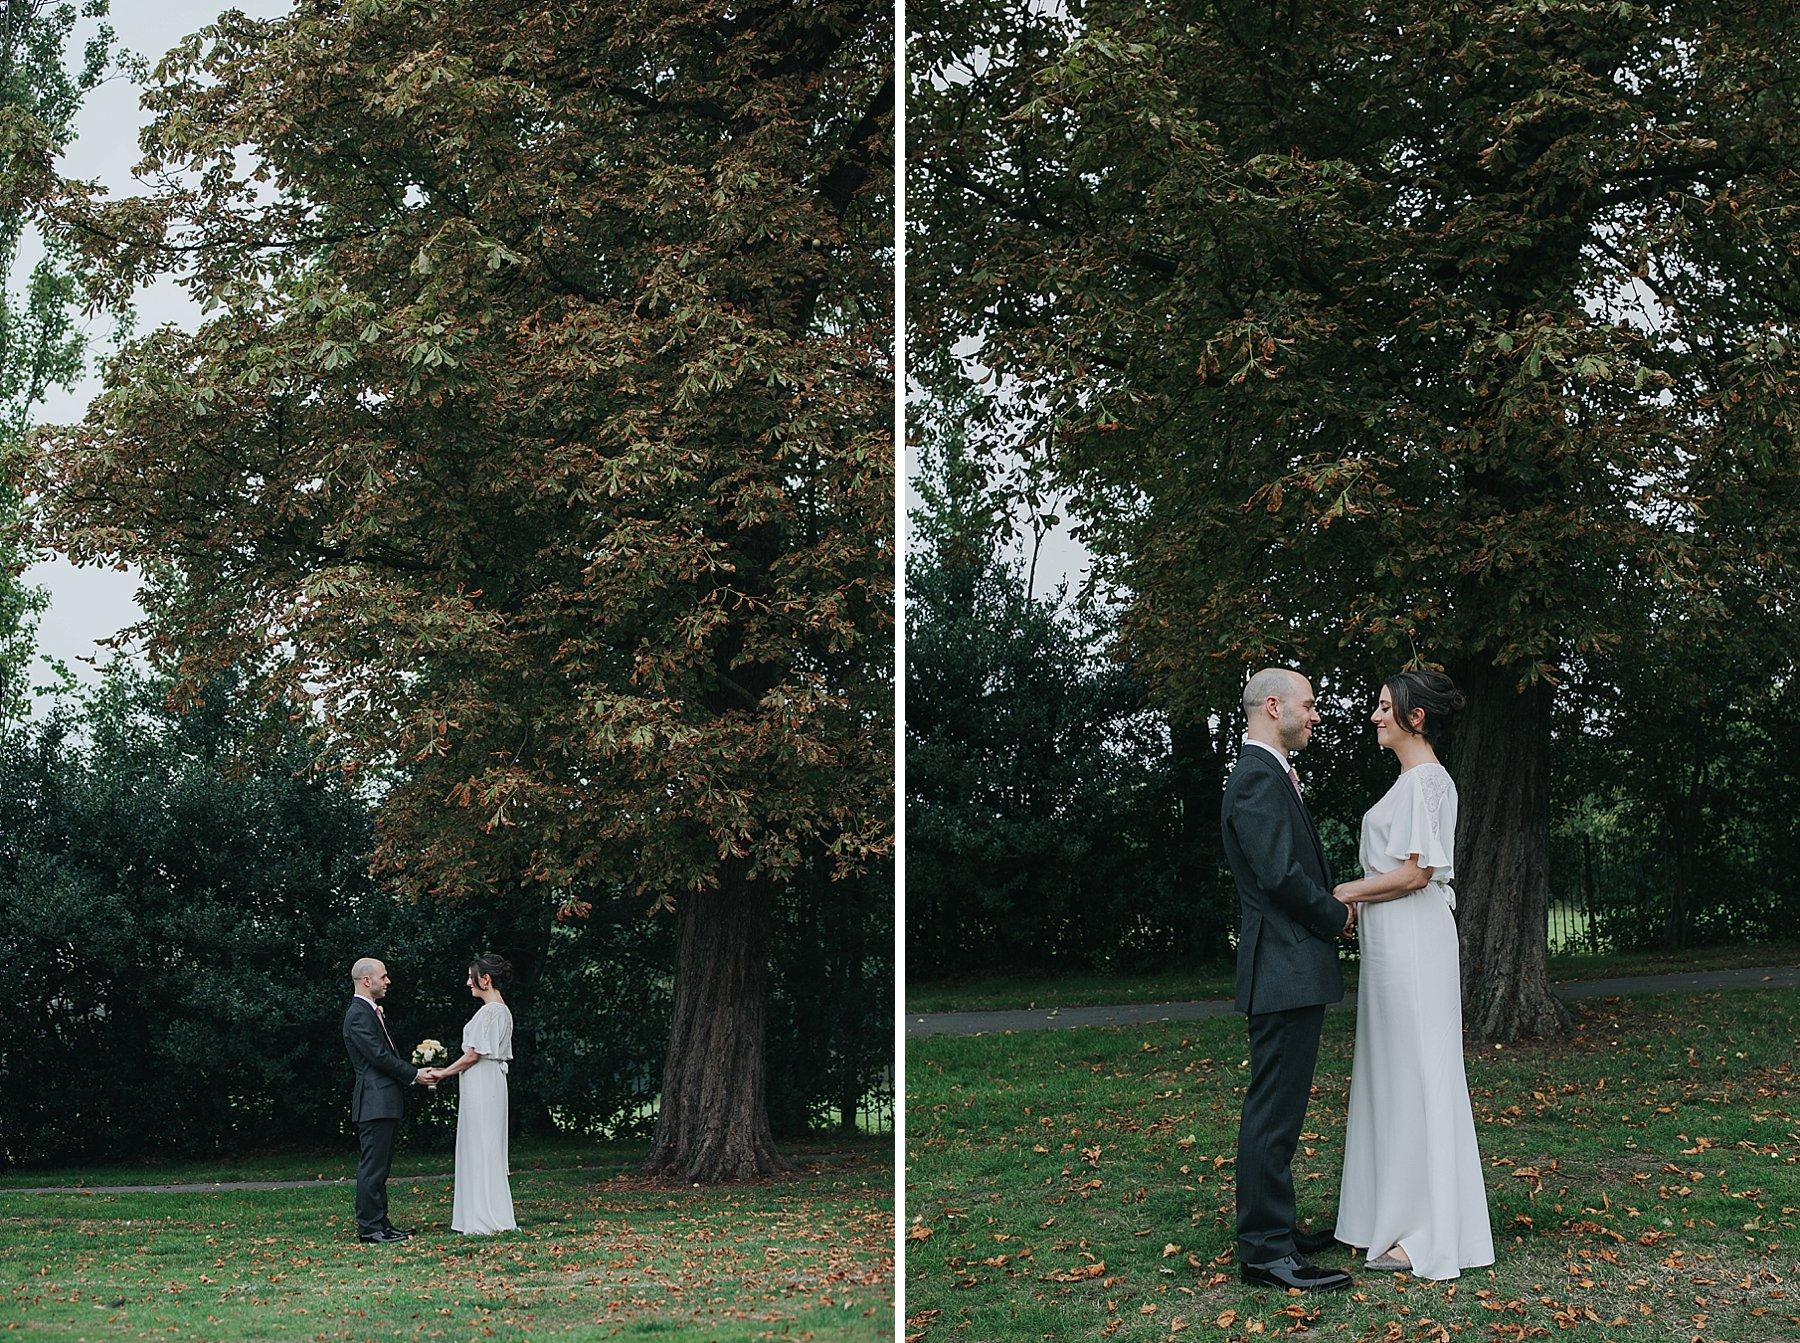 146 Belair Park Dulwich trees wedding alternative portrait.jpg